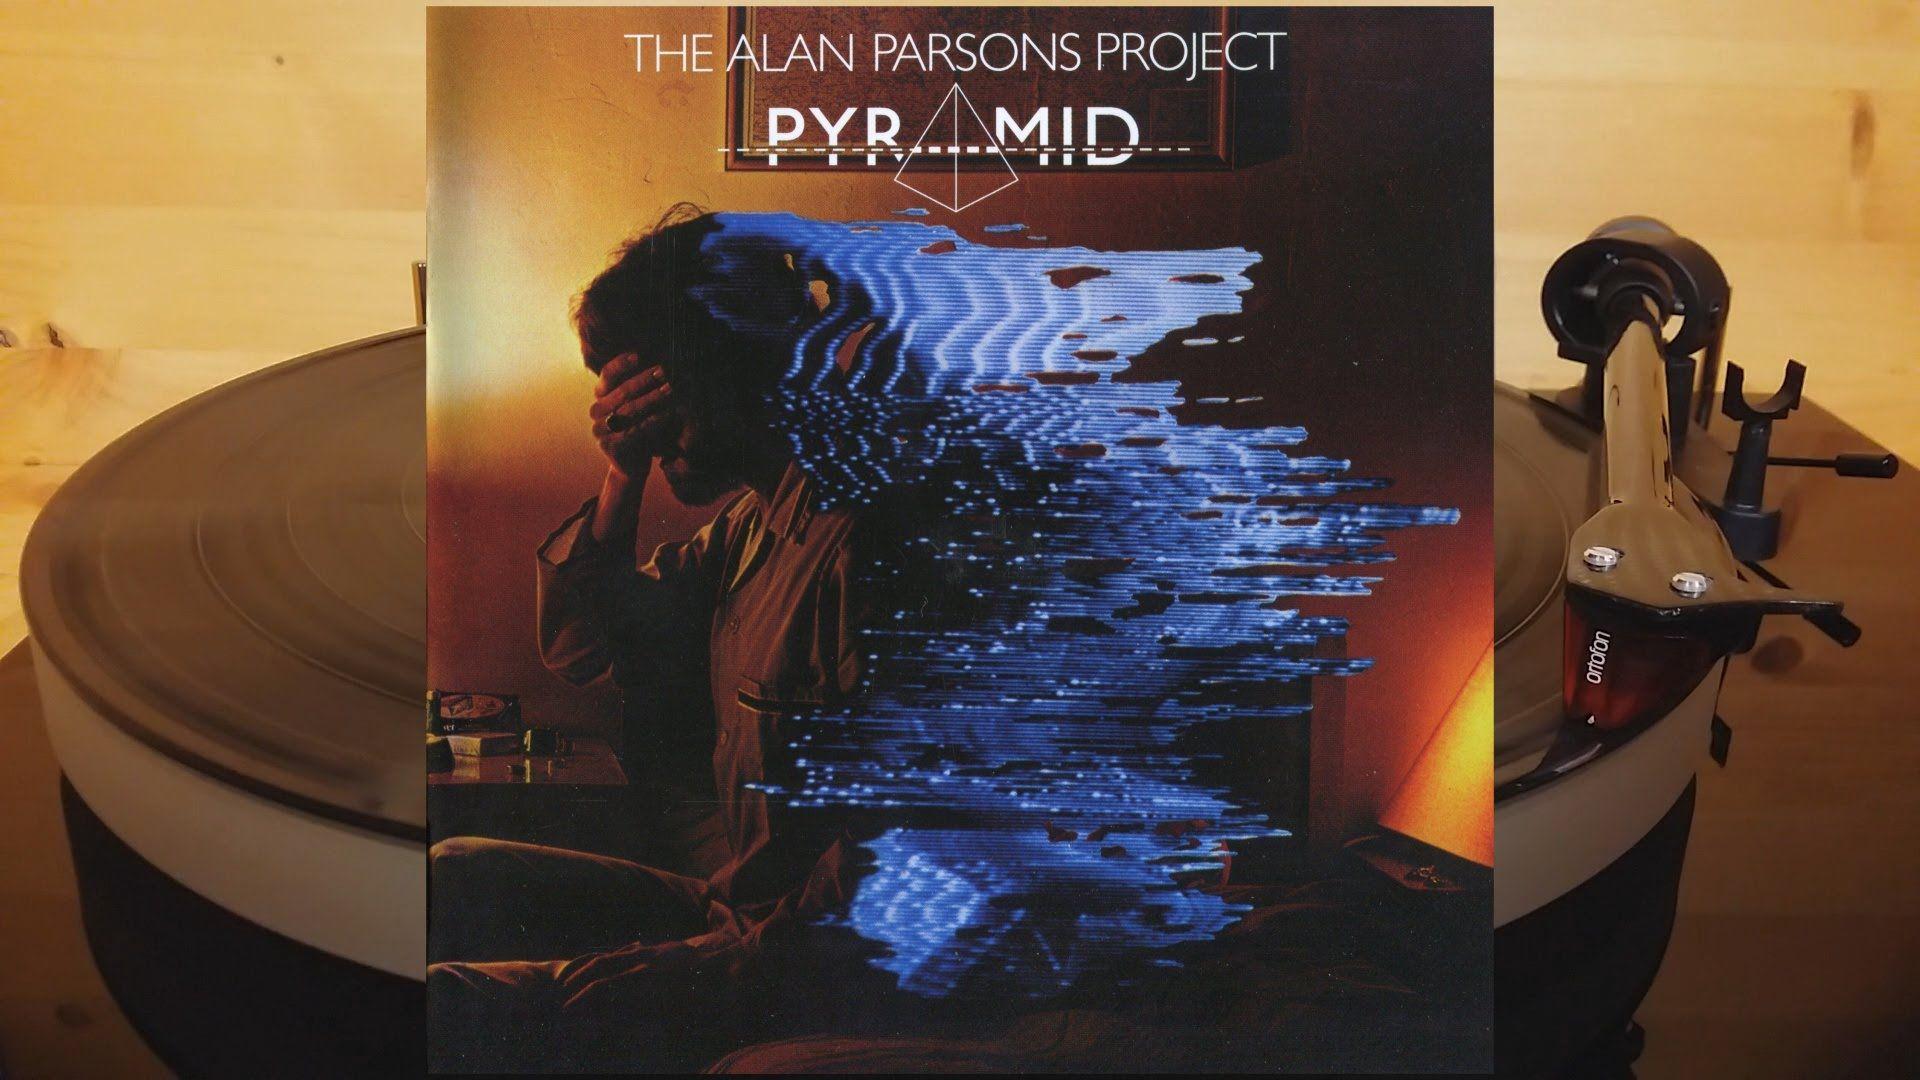 The Alan Parsons Project Pyramid Vinyl Alan Parsons Project Alan Parsons Pyramids